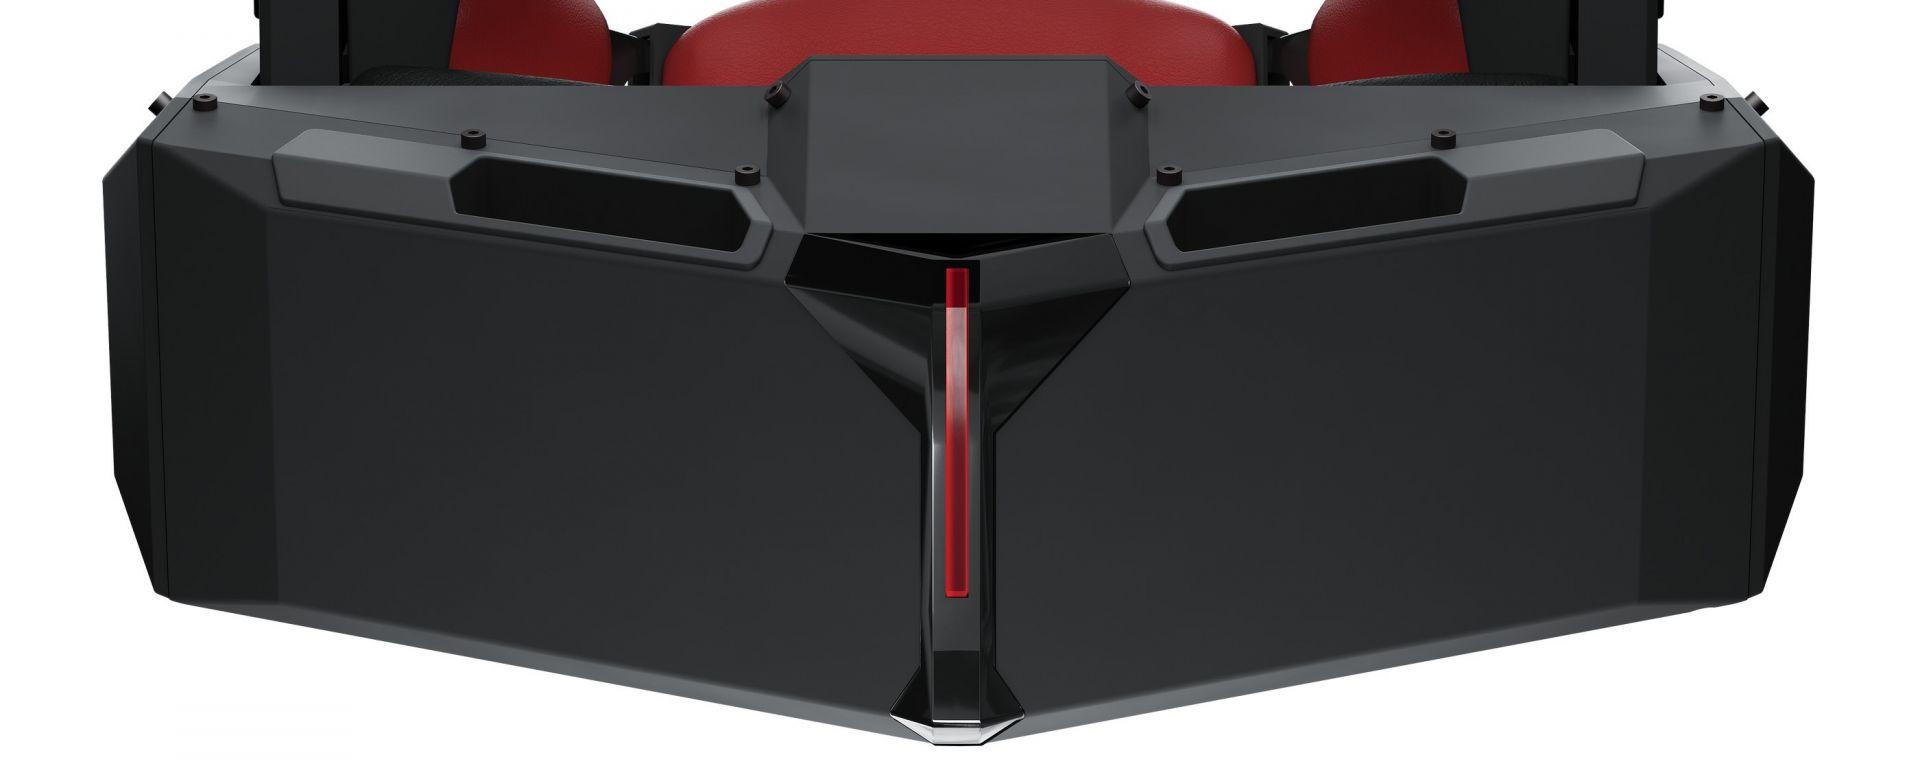 Acer StarVR batte Oculus Rift e HTC Vive tra i visori VR